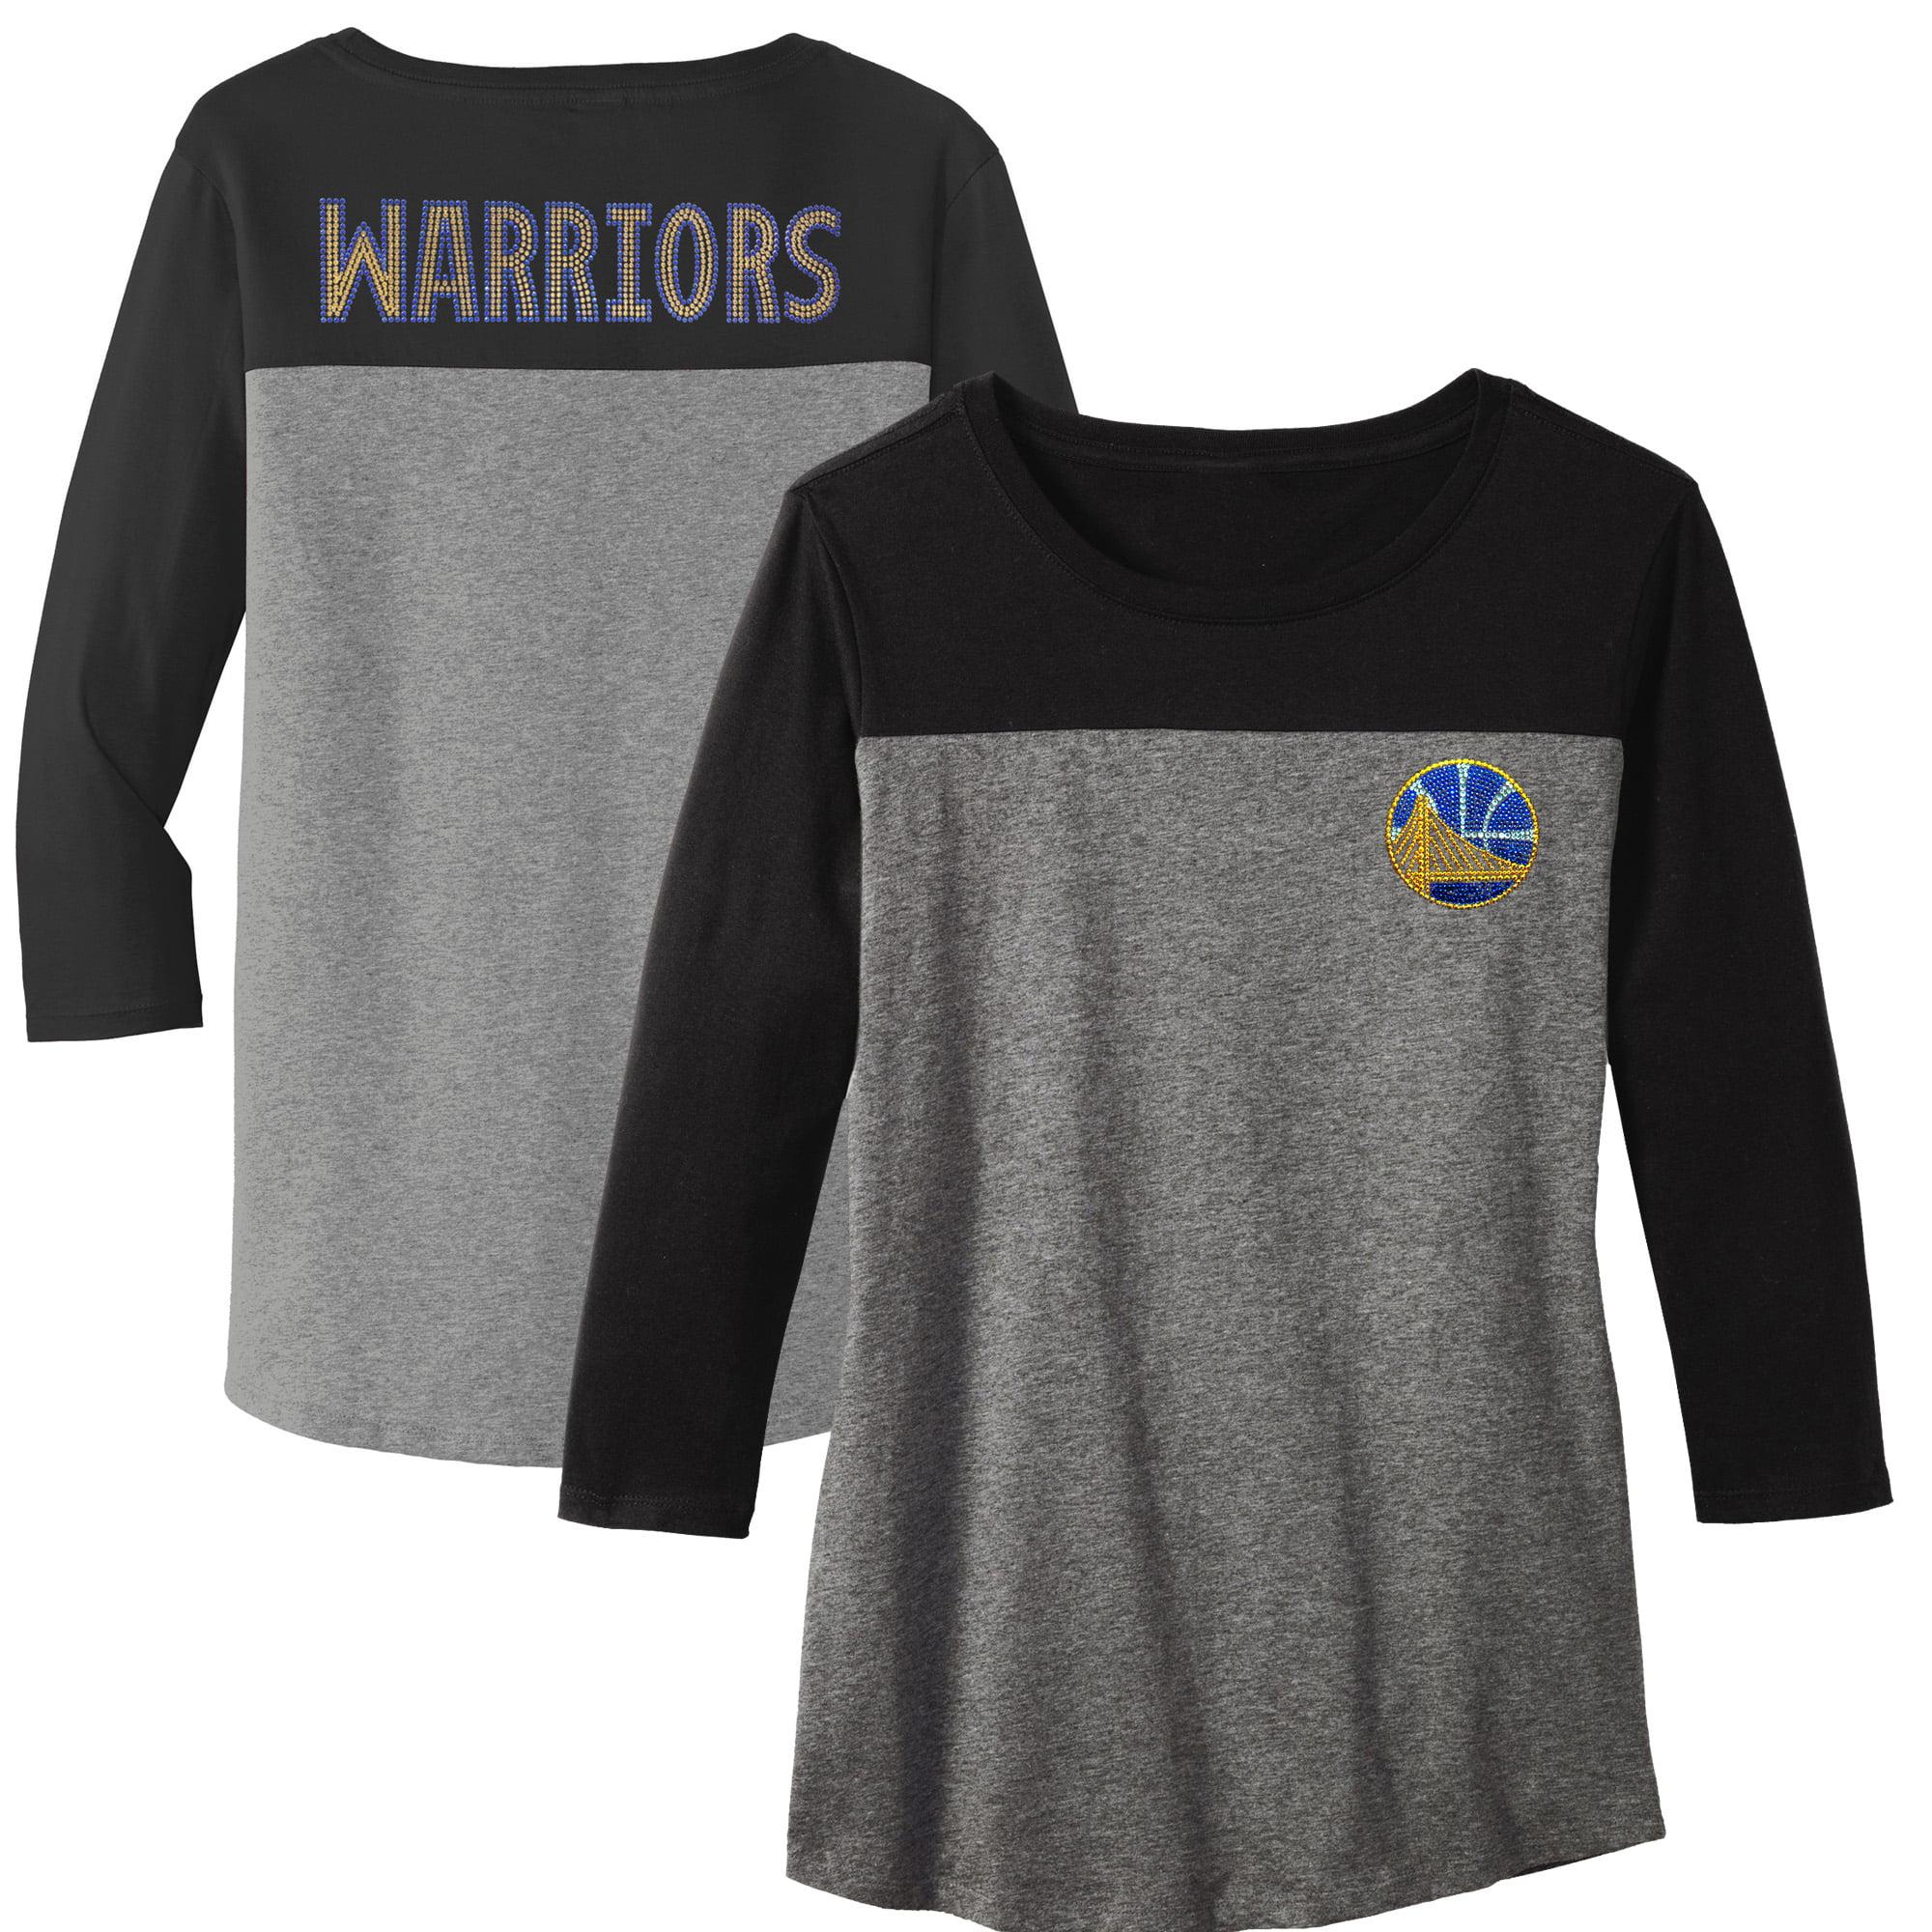 Golden State Warriors Women's Rally Rhinestone Color Blocked 3/4 Sleeve T-Shirt - Gray